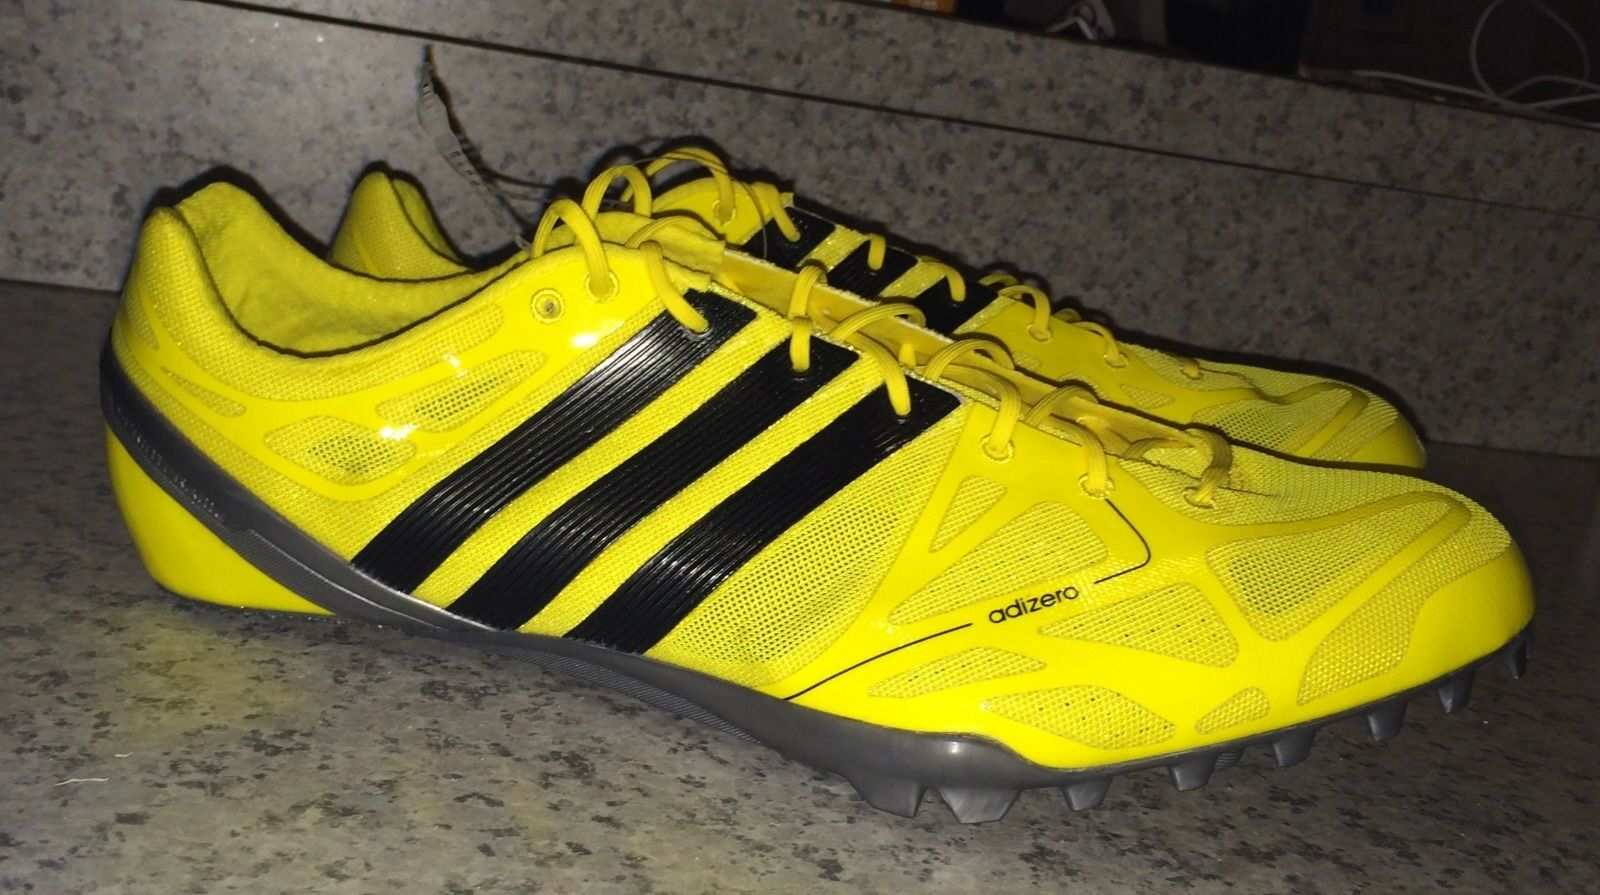 Neue männer adidas adizero prime accelerator gelb 12,5 13 - sprint - track - spitzen